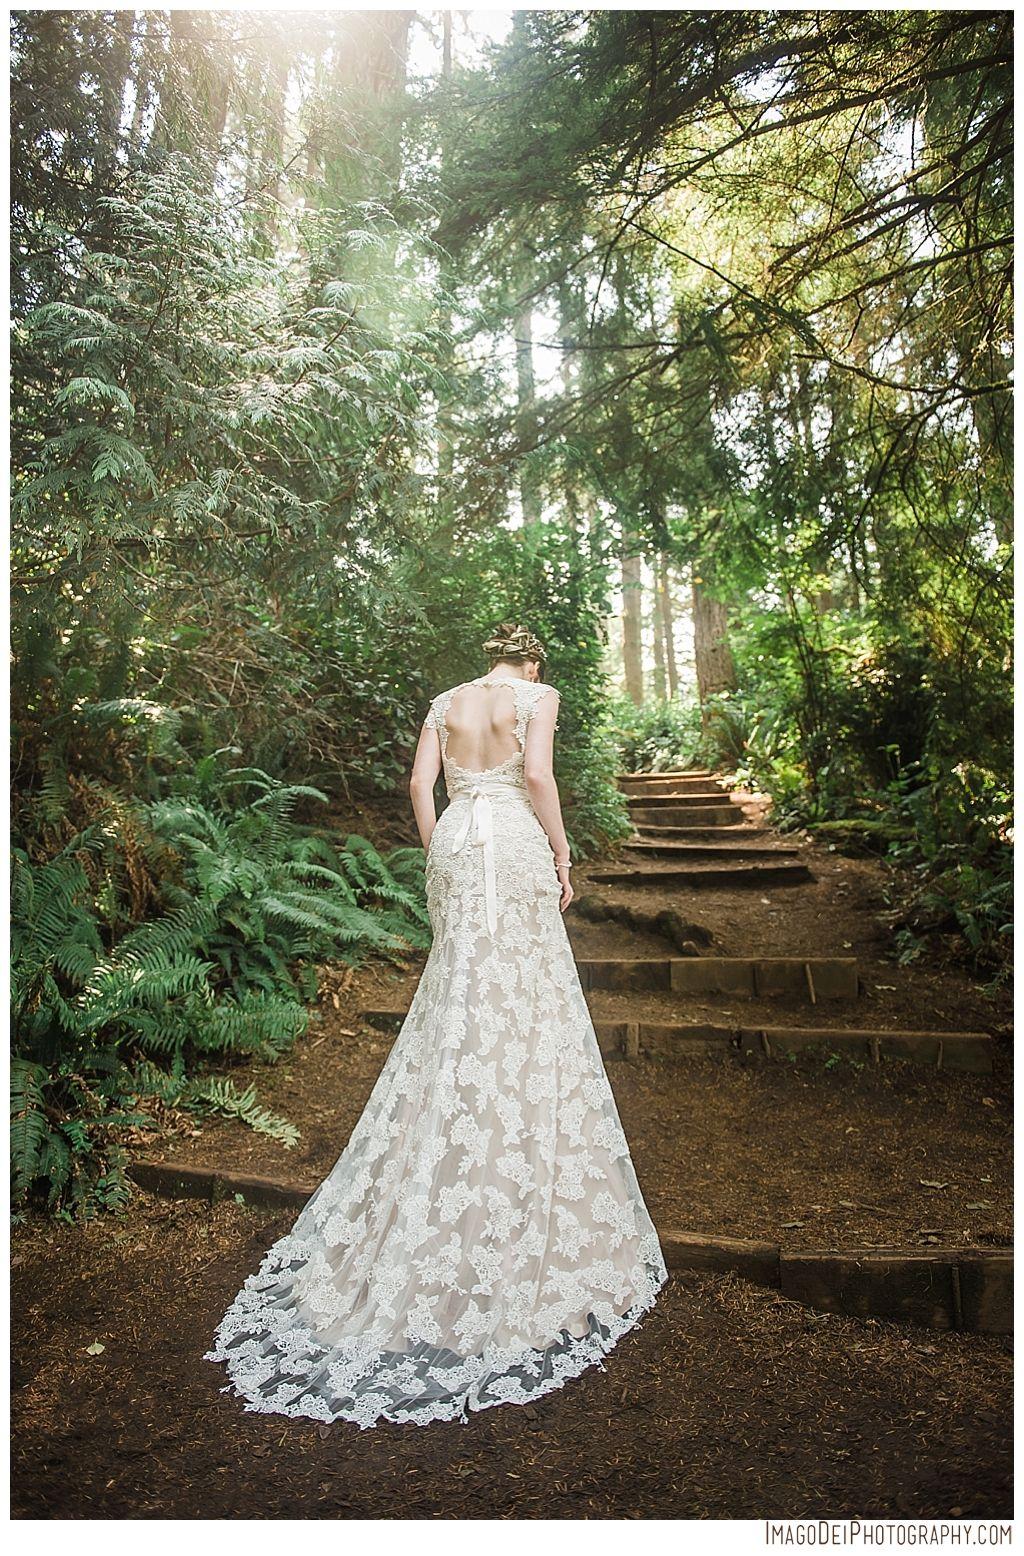 Ethereal Wedding on the Oregon Coast // Forest Wedding